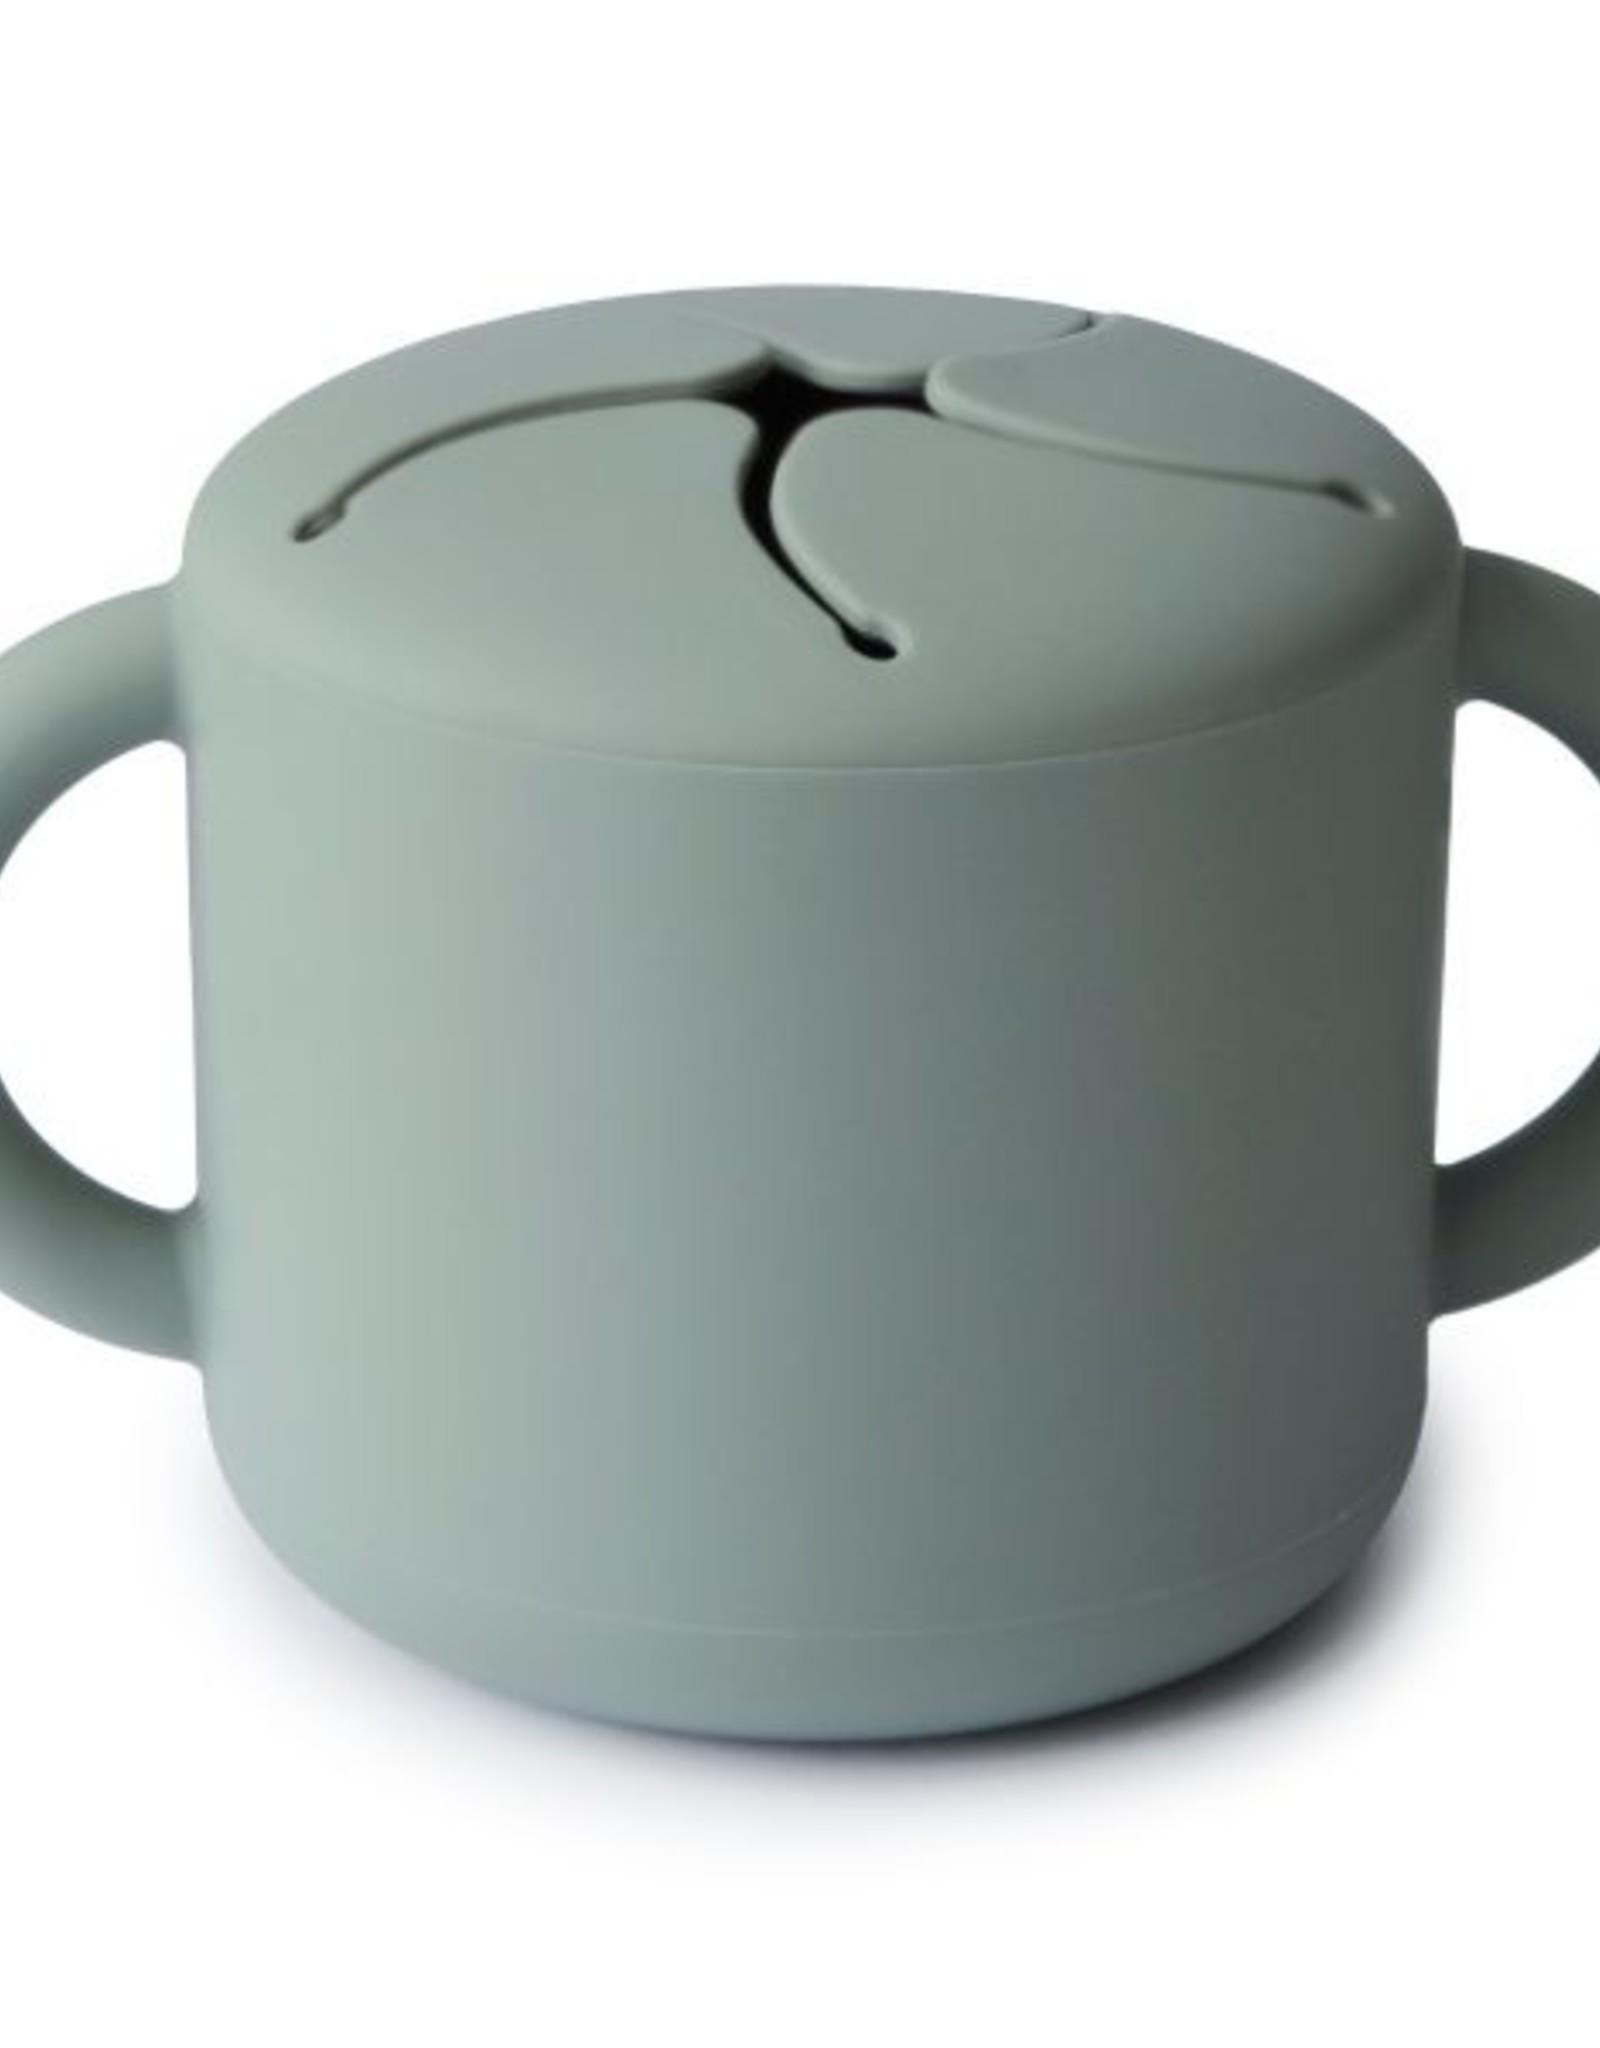 Mushie snack cup- camridge blue